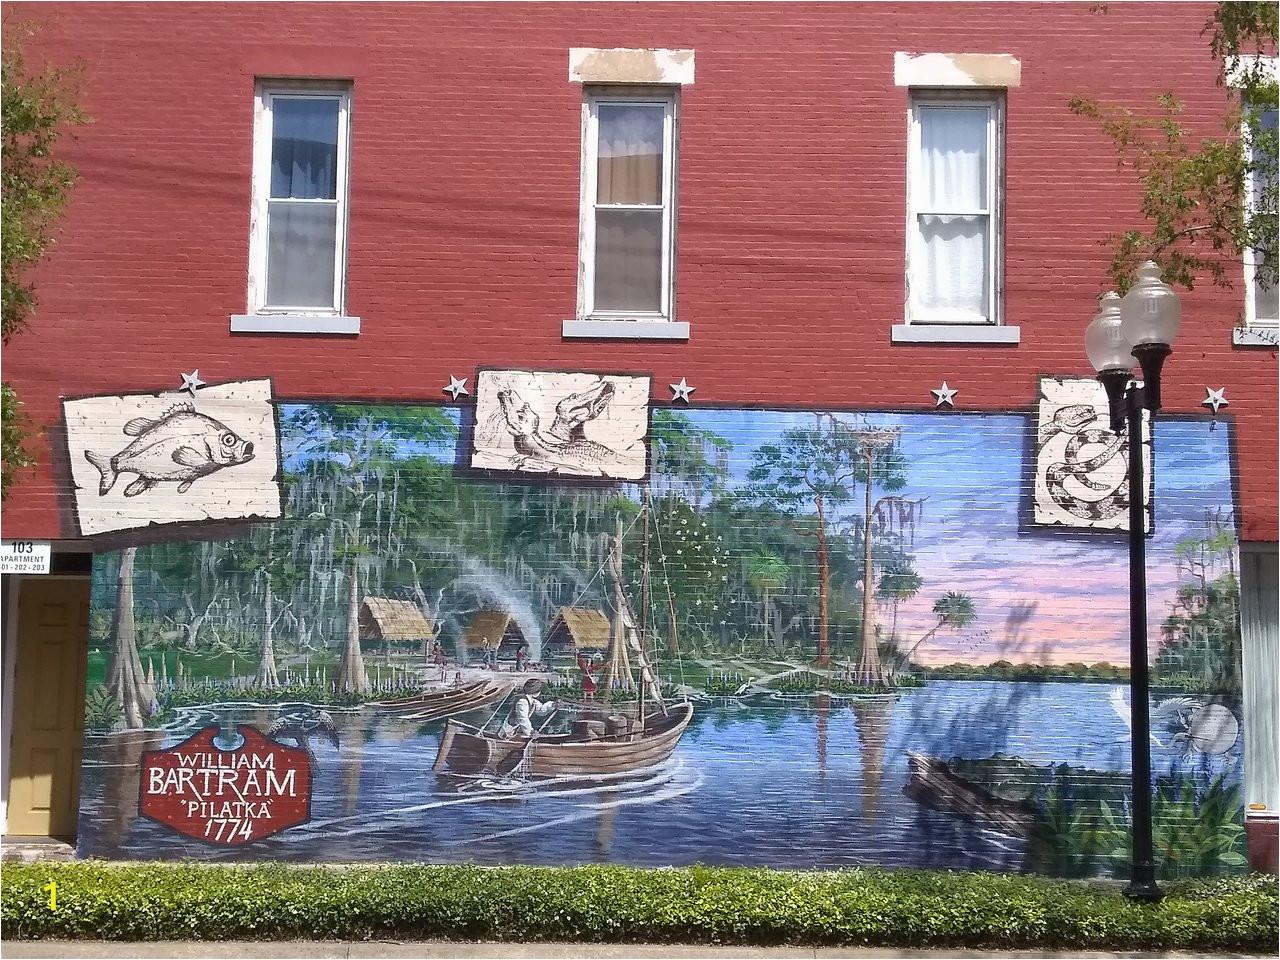 bartram mural